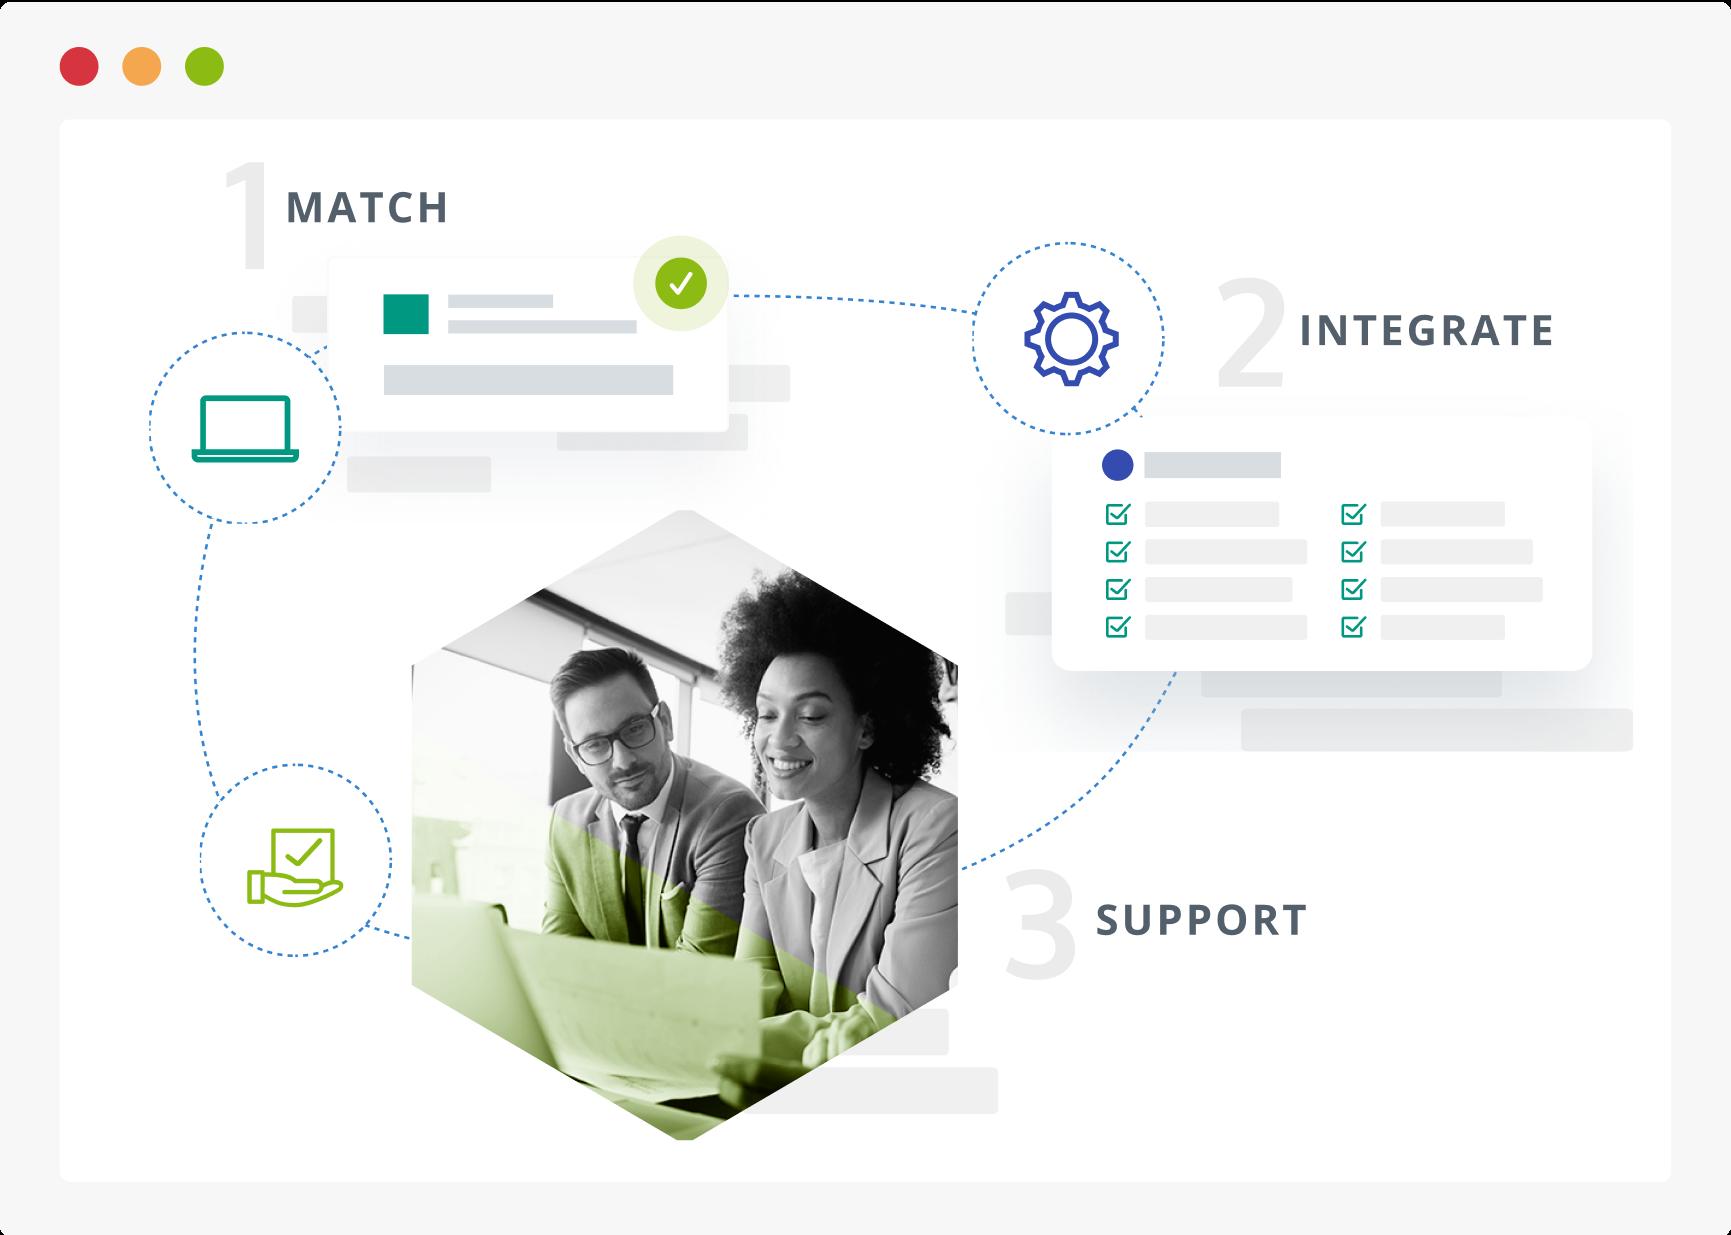 match-integrate-support